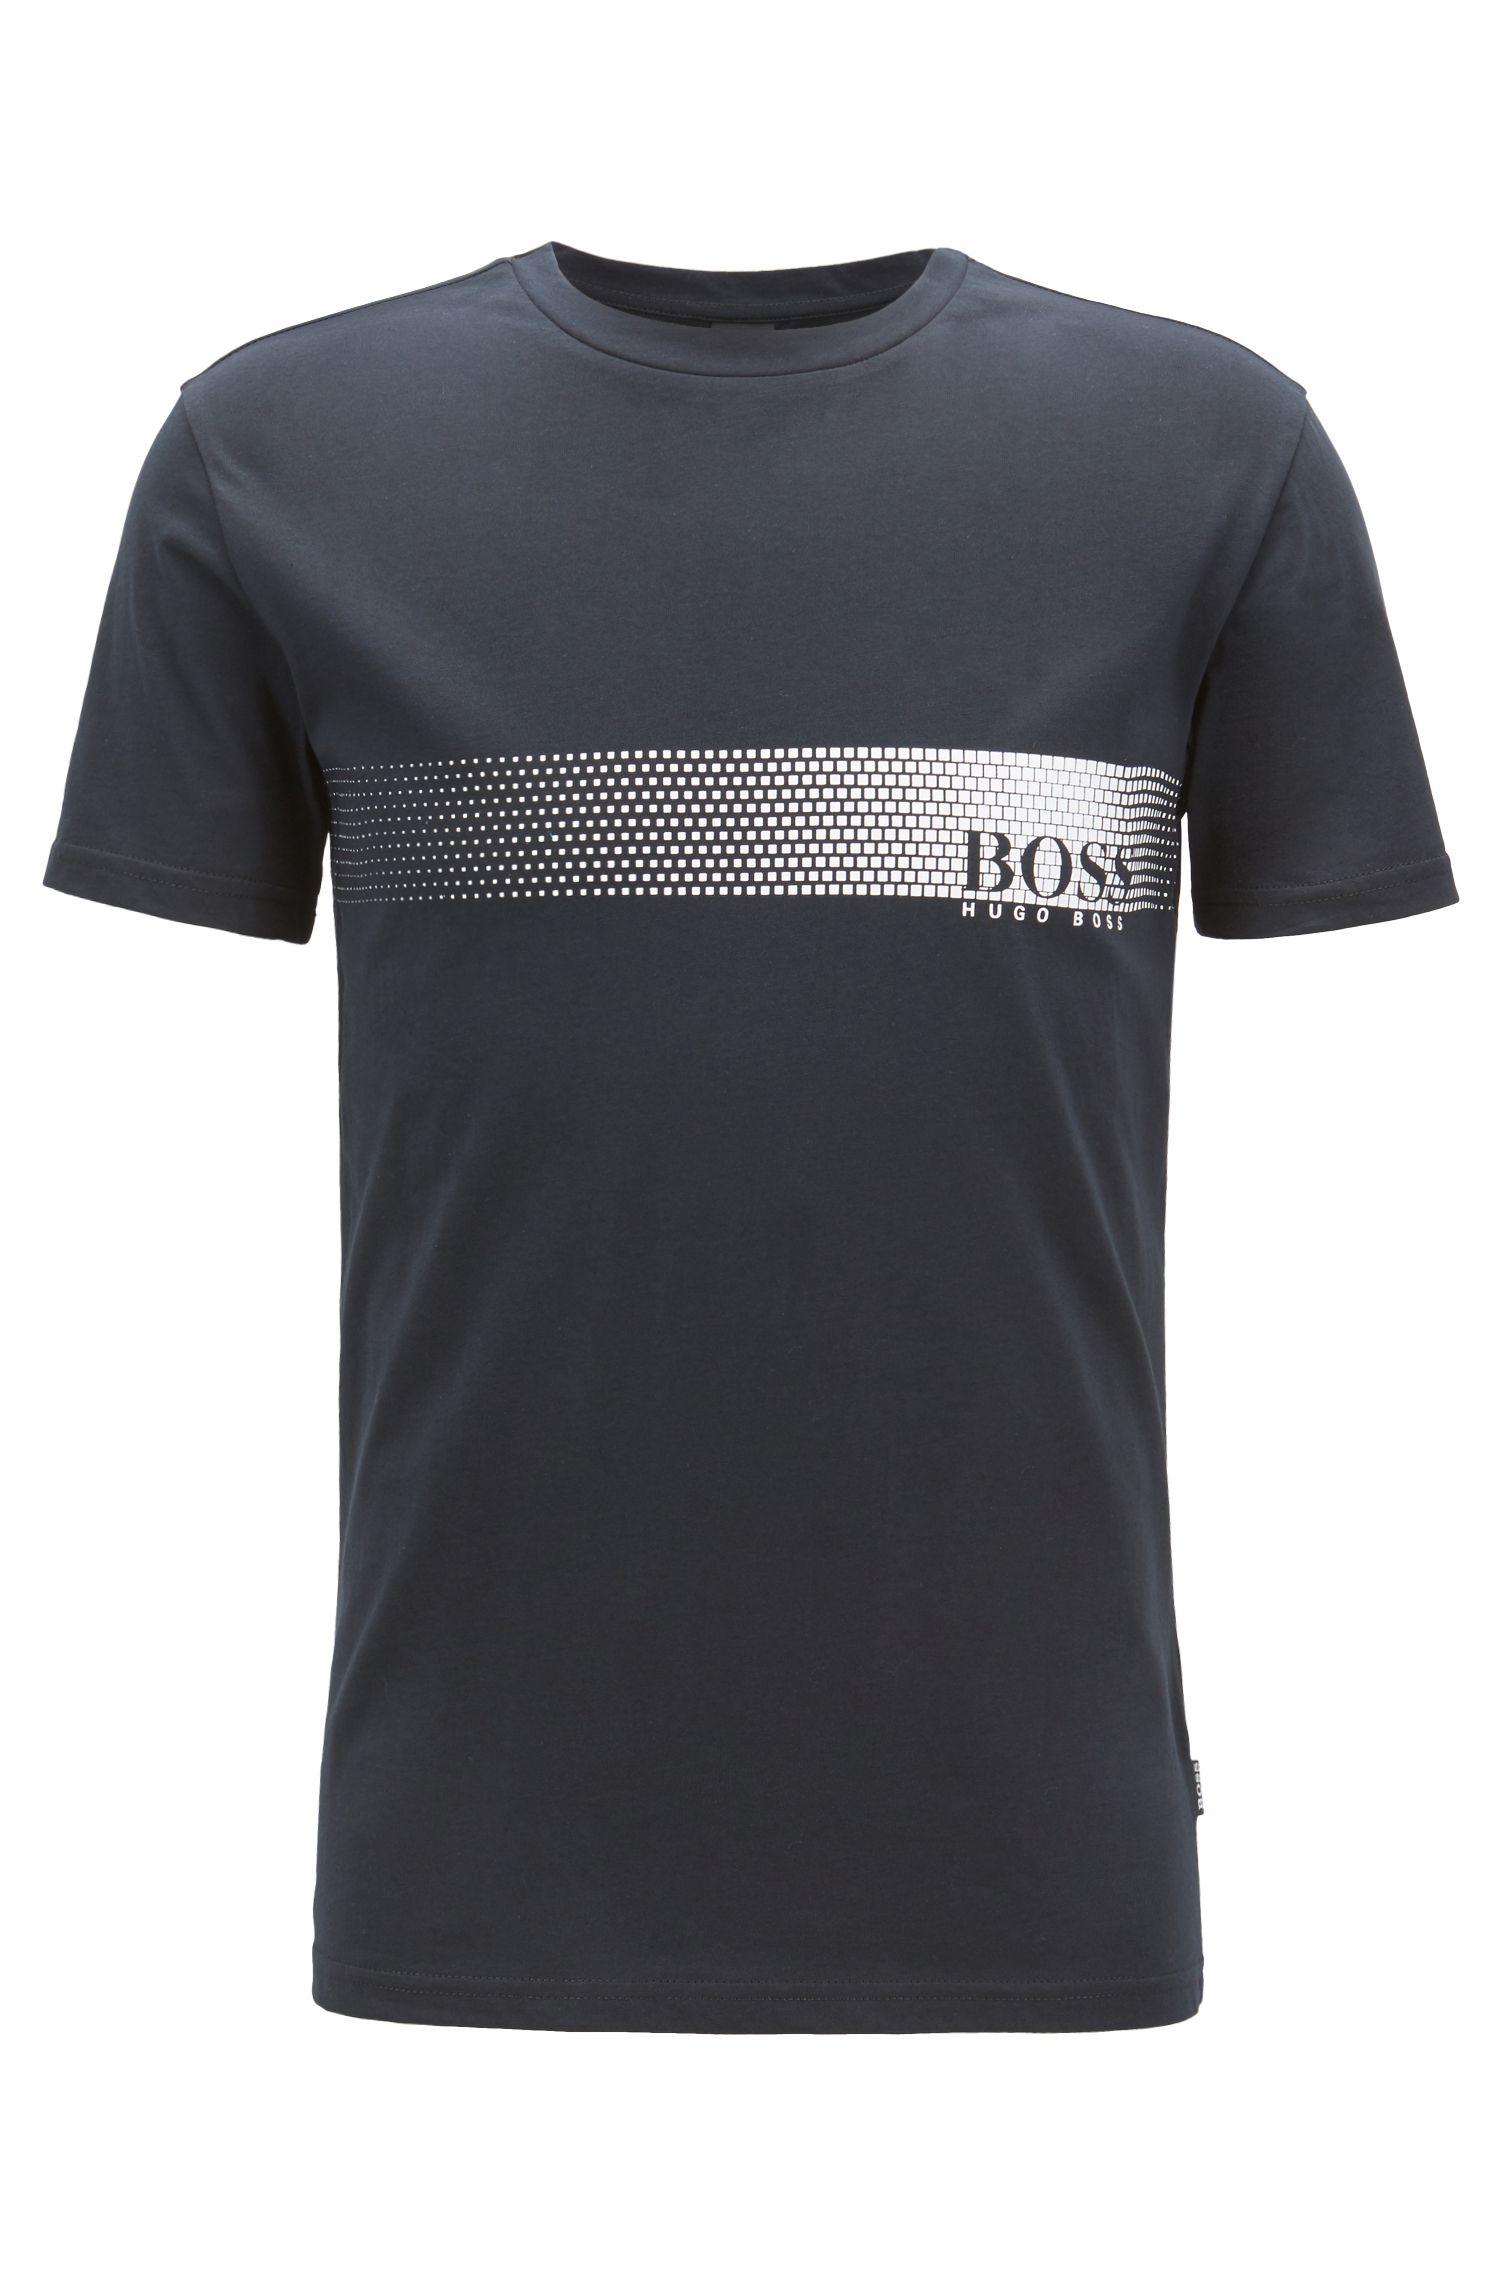 Sunsafe logo T-shirt in cotton, Black